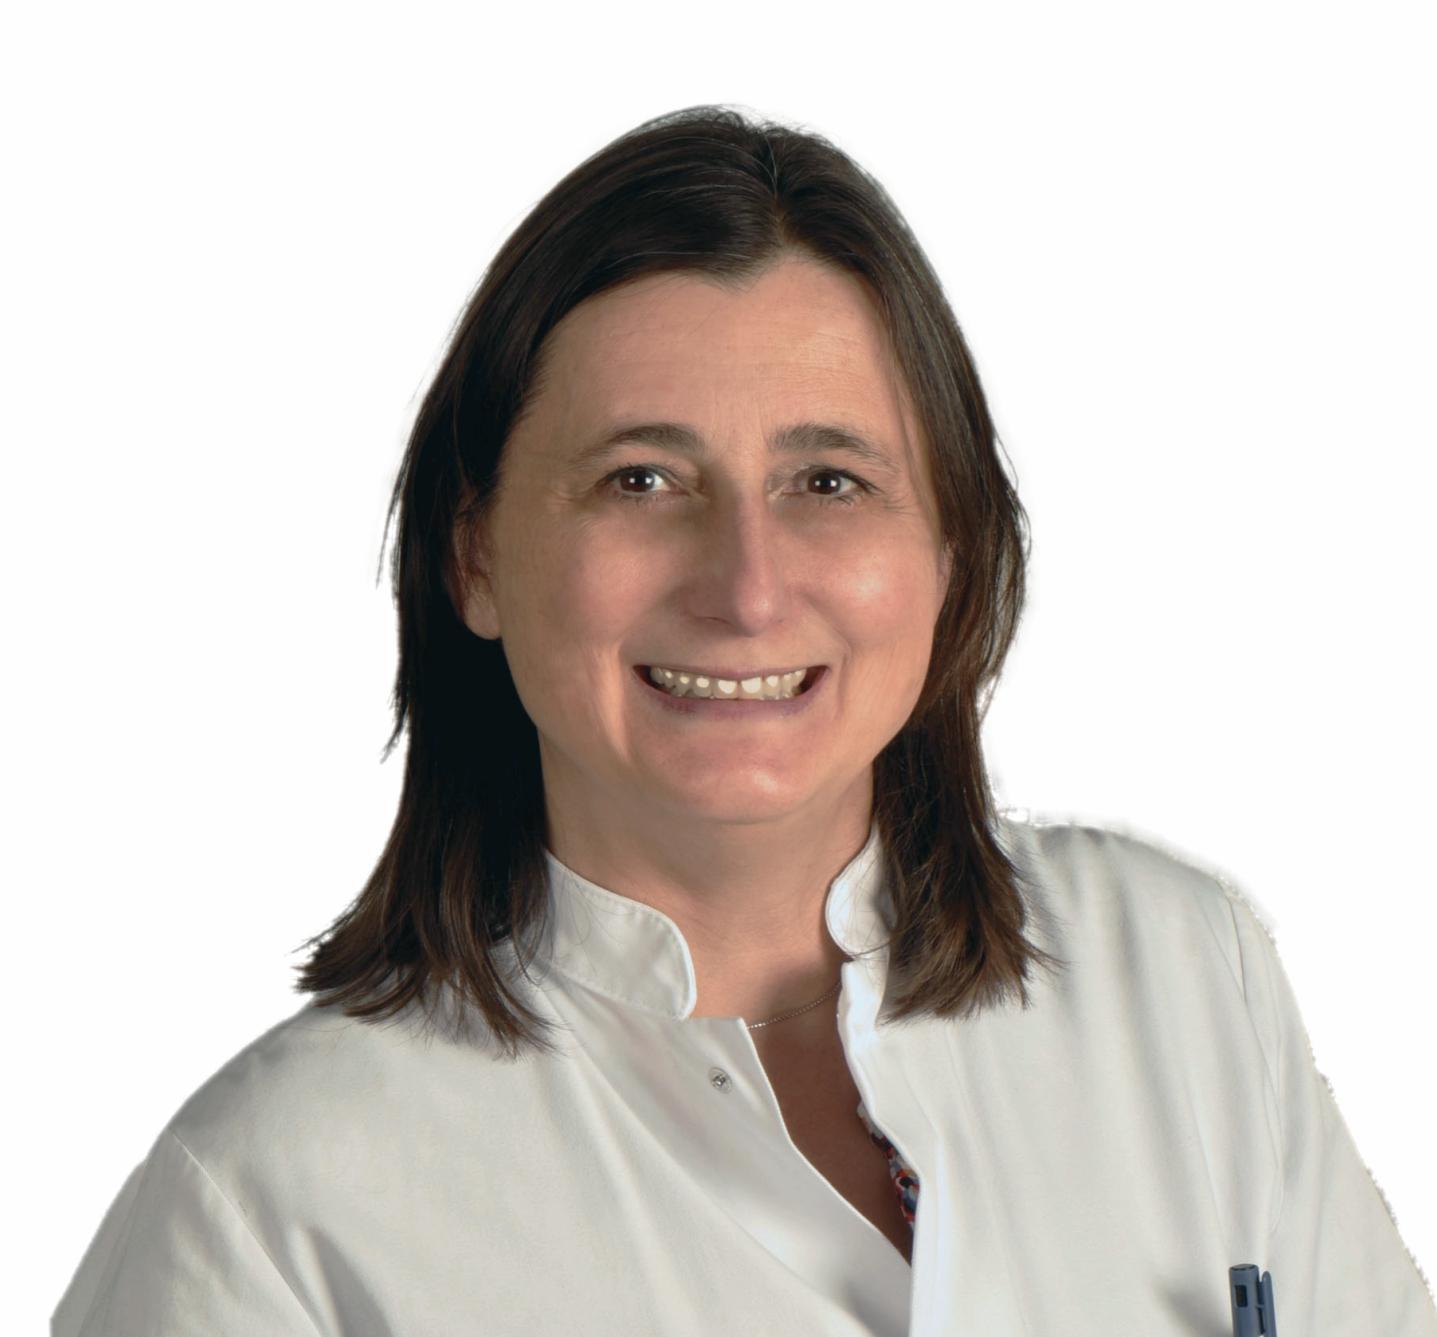 Dr. Katia VandenDwey